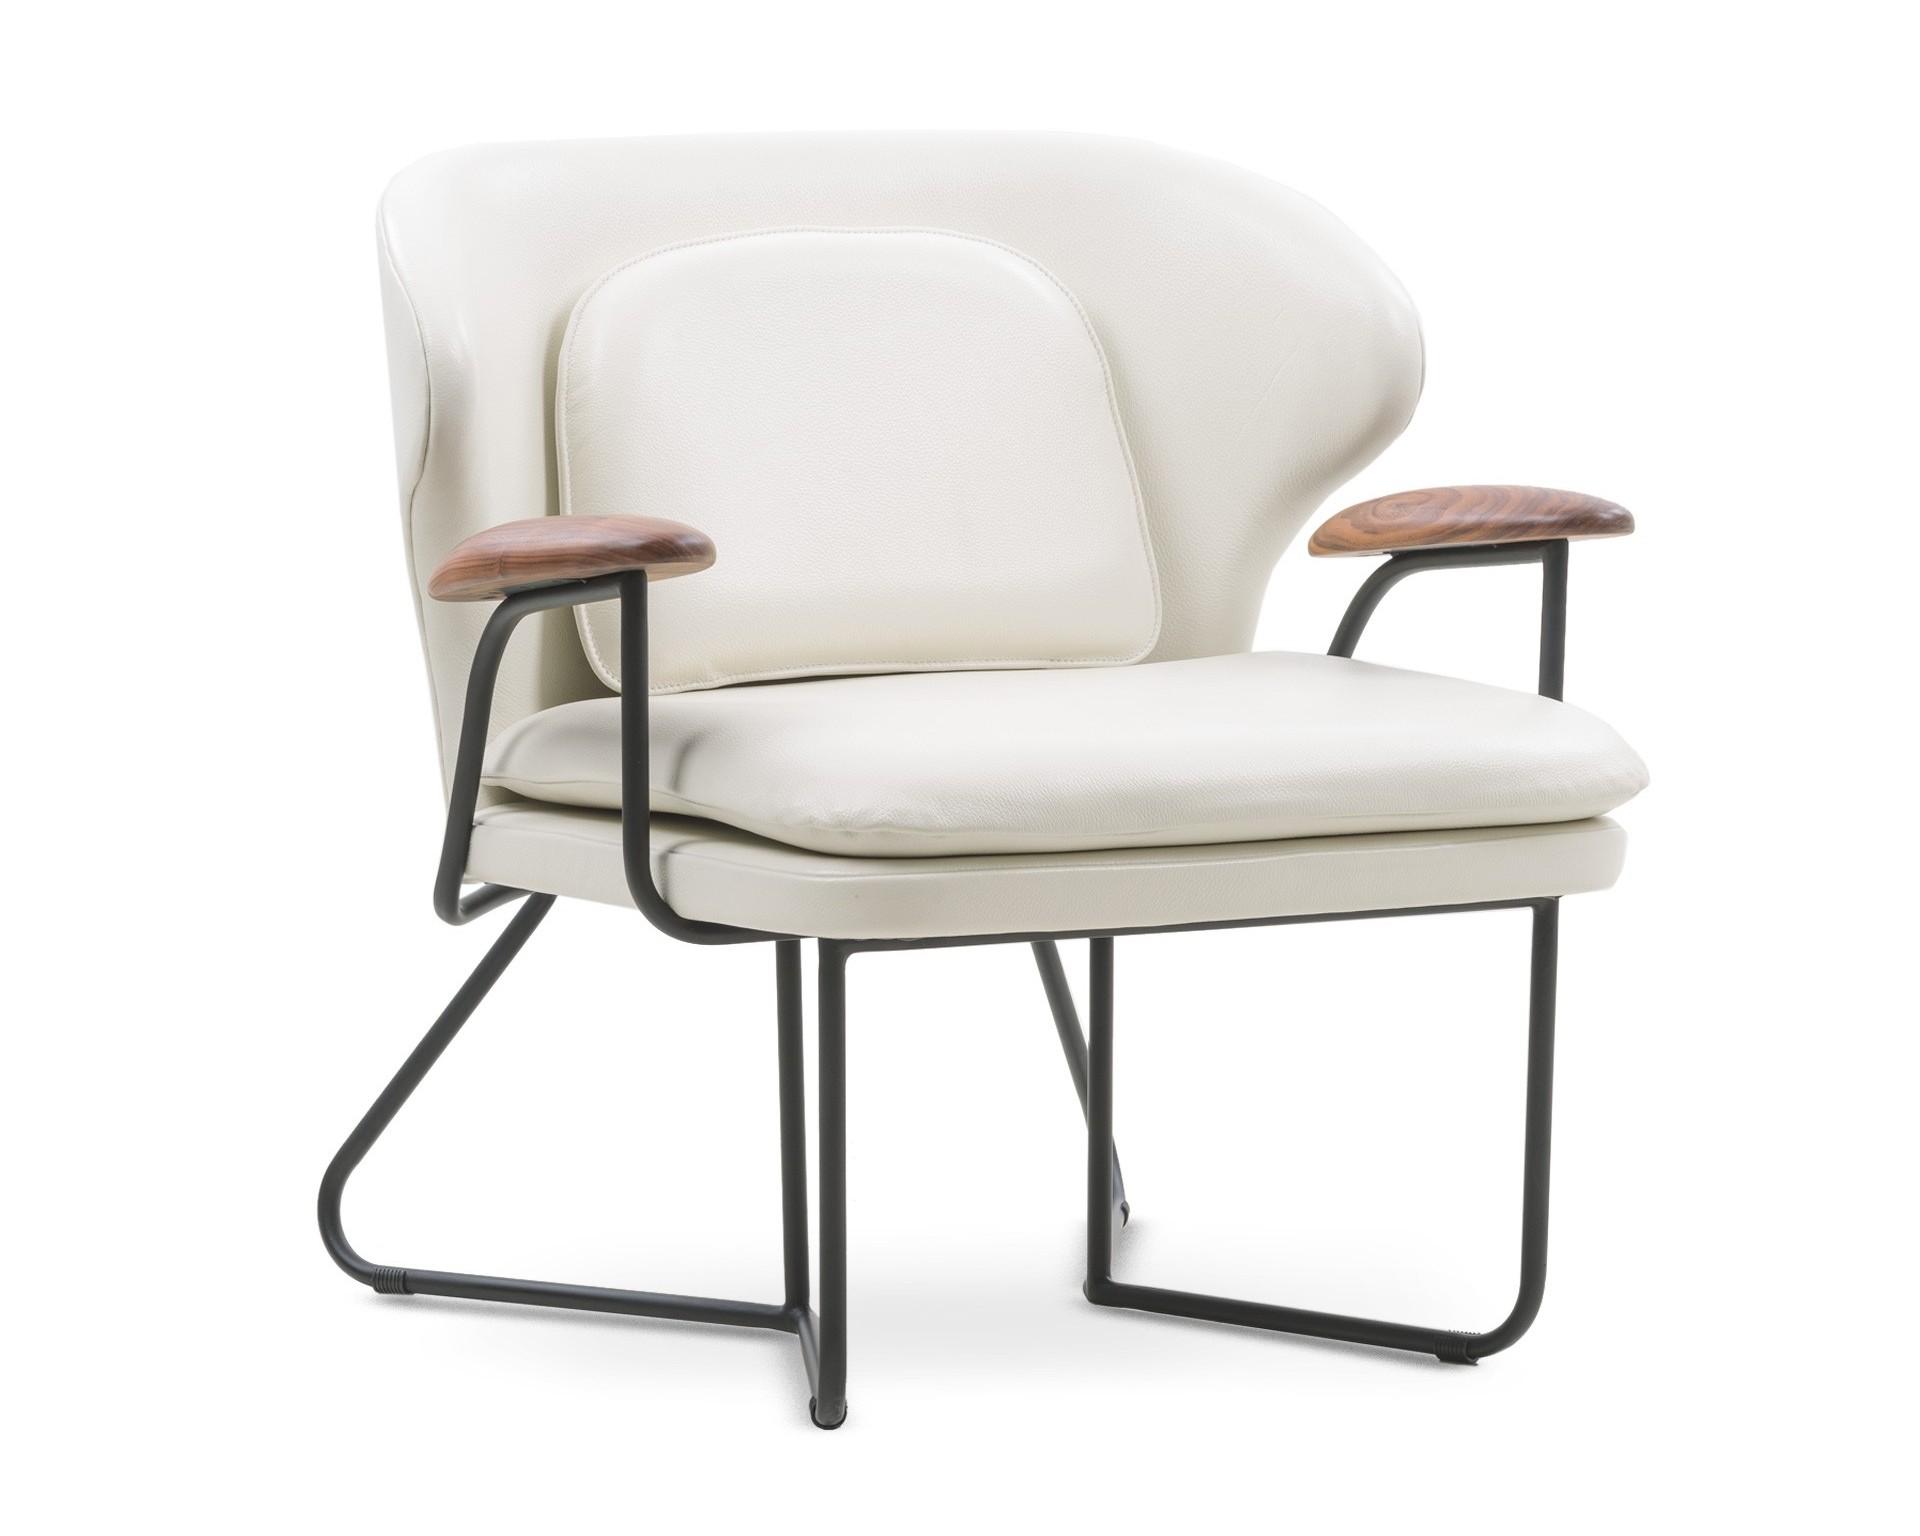 Chillax Lounge Chair : chillaxlowchair1 02 from lindsfurniture.com size 1920 x 1536 jpeg 206kB